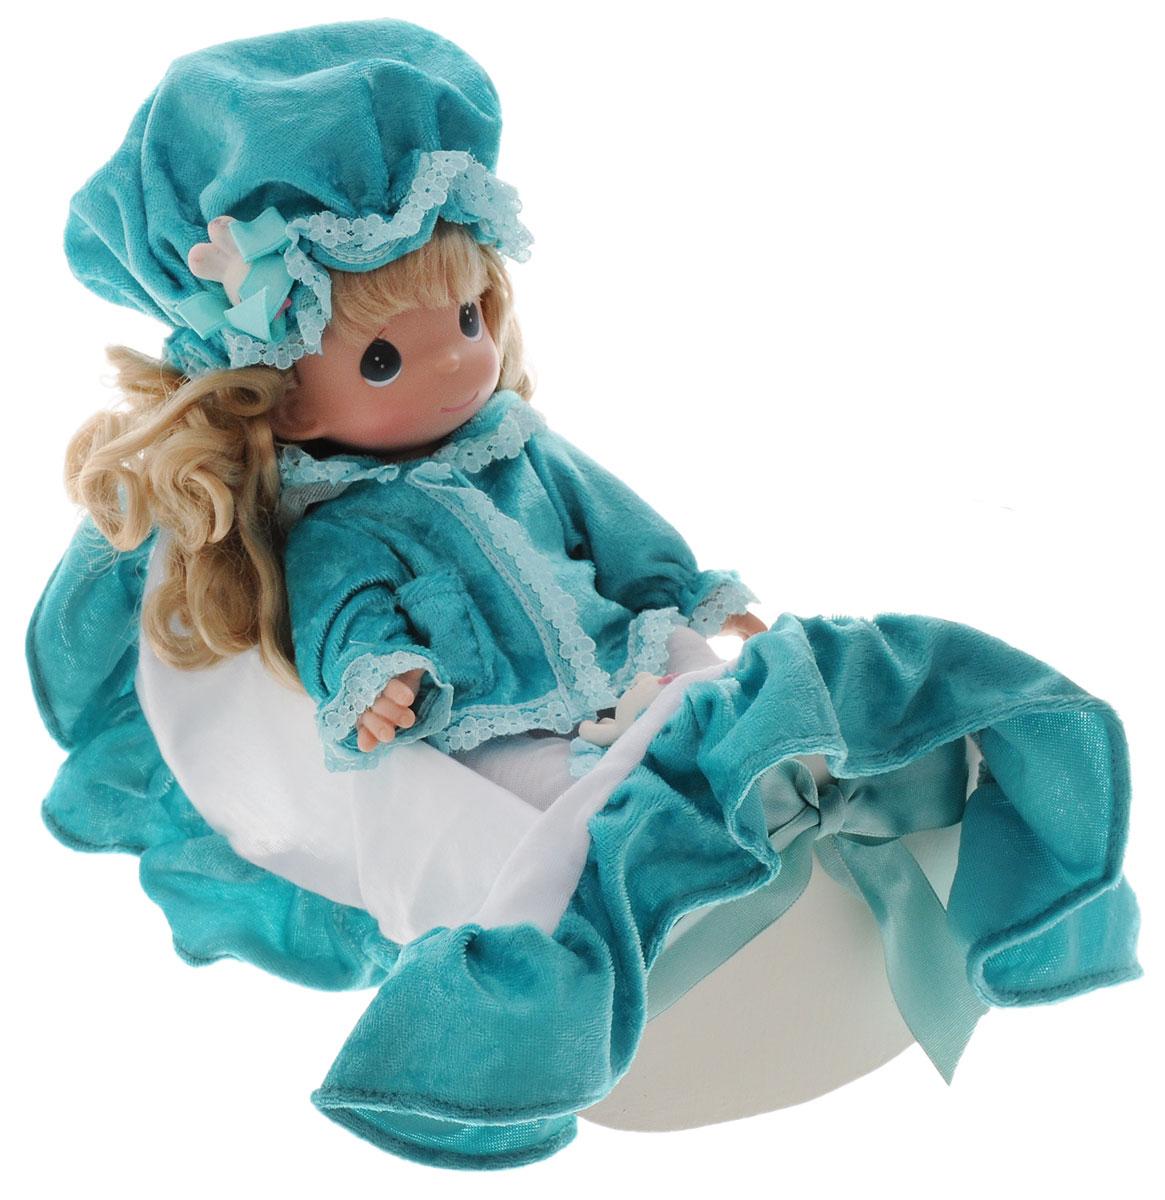 Precious Moments Кукла Рок-бай младенцев девочка precious moments кукла кай